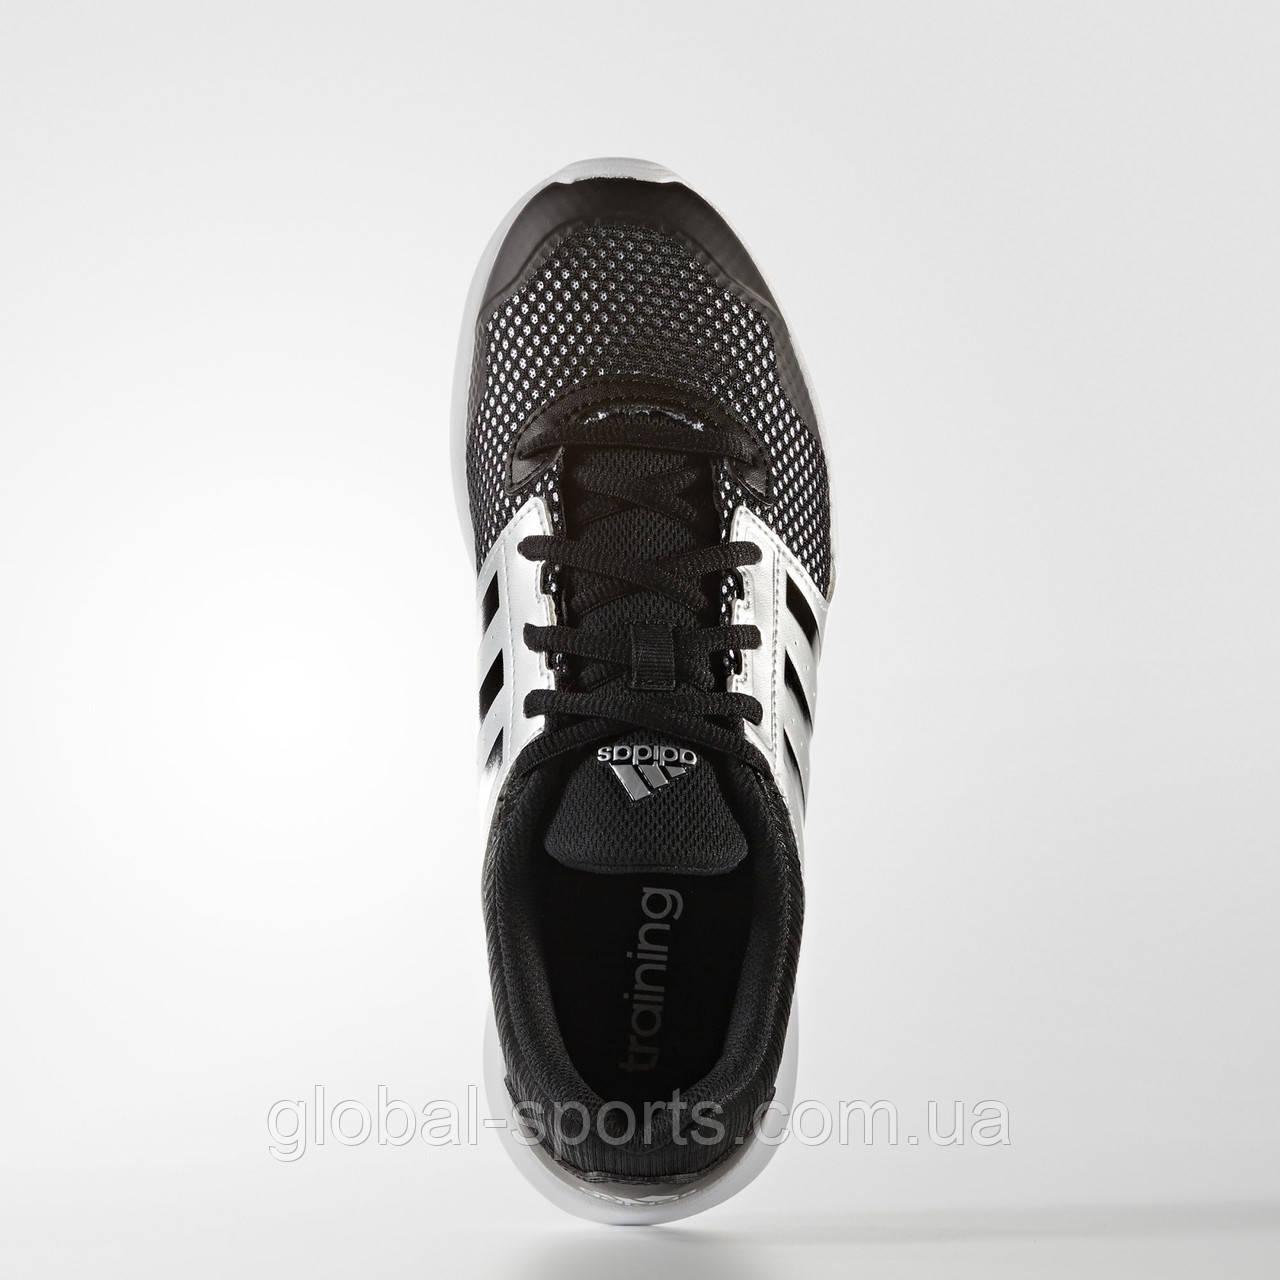 Женские кроссовки Adidas Essential Fun 2.(Артикул BB1524)  продажа ... ed759cf1002